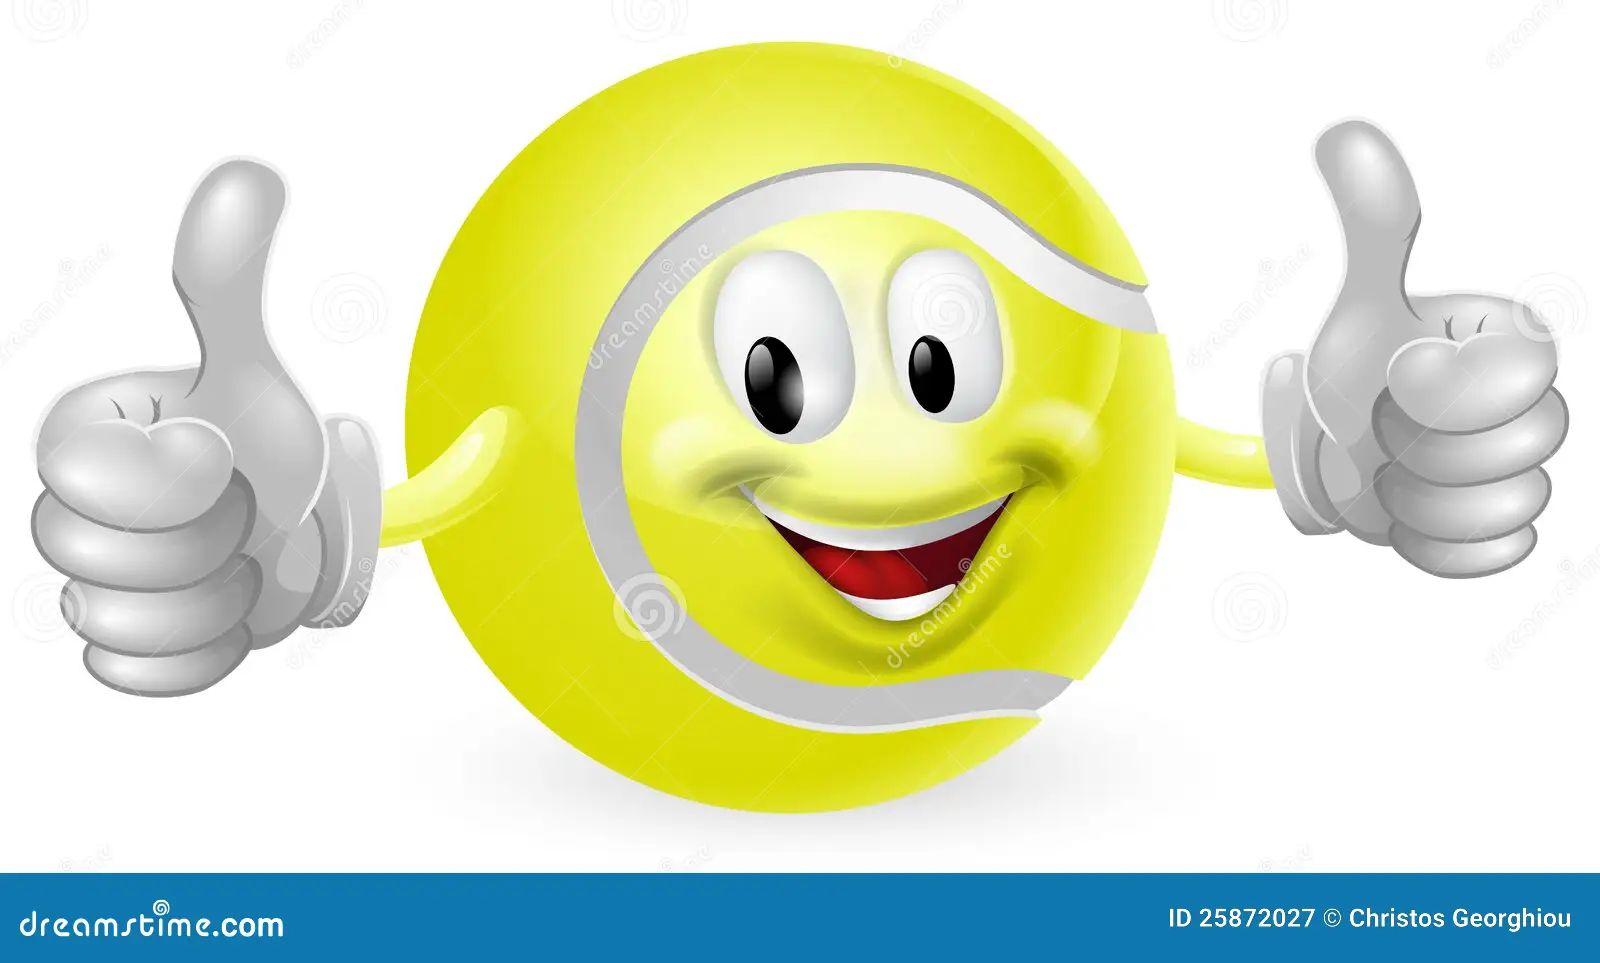 Tennis ball mascot royalty free stock photography